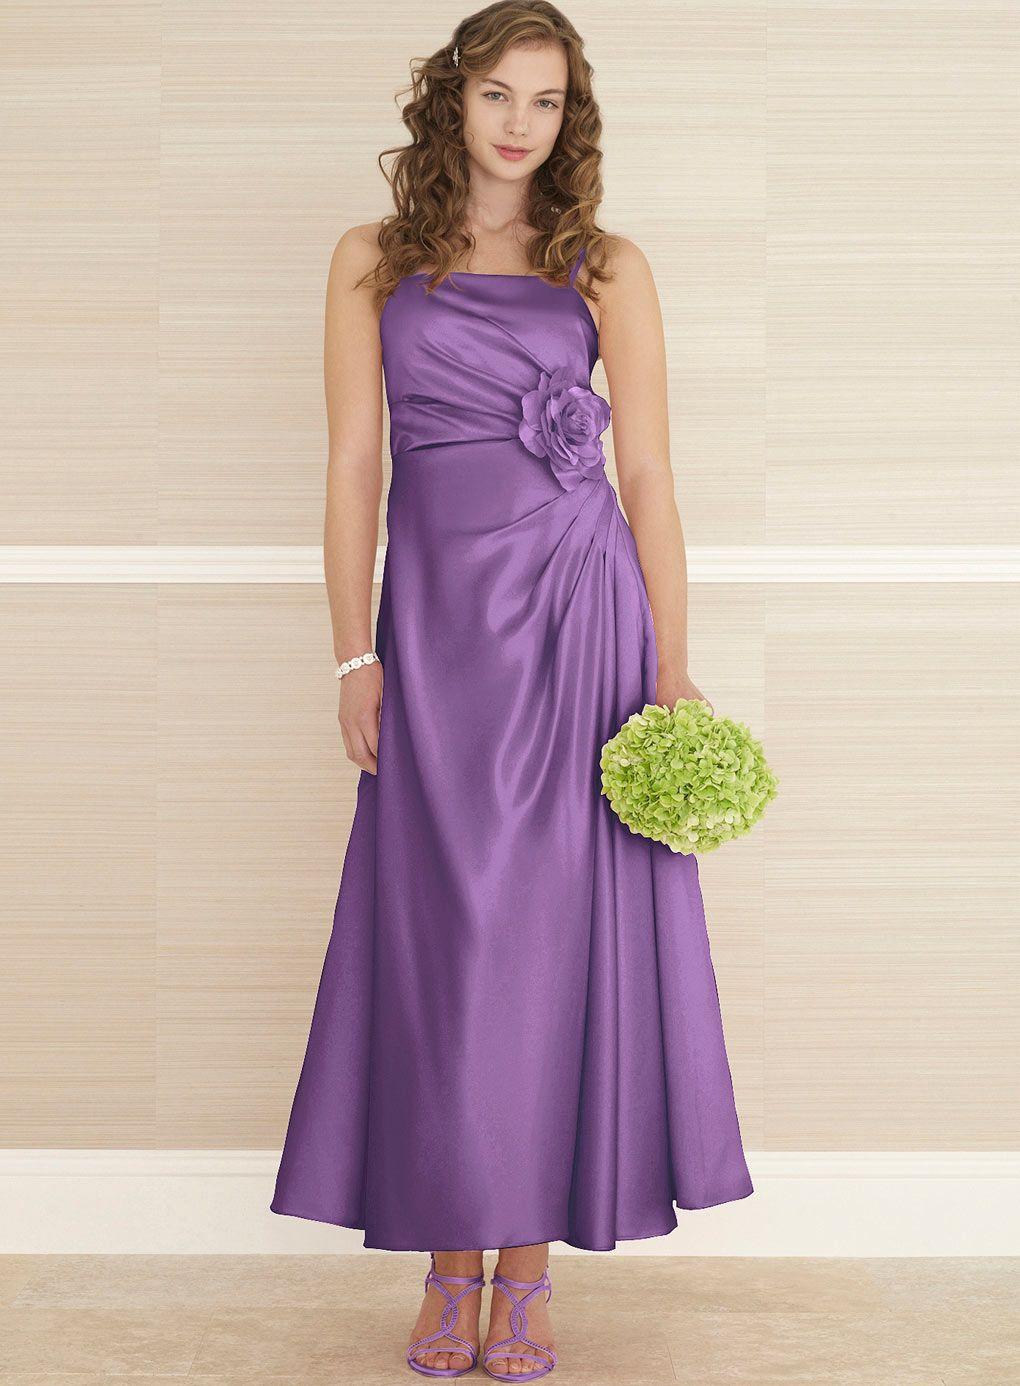 Teen Bridesmaid Dress | My Wedding | Pinterest | Wedding, Dress ...